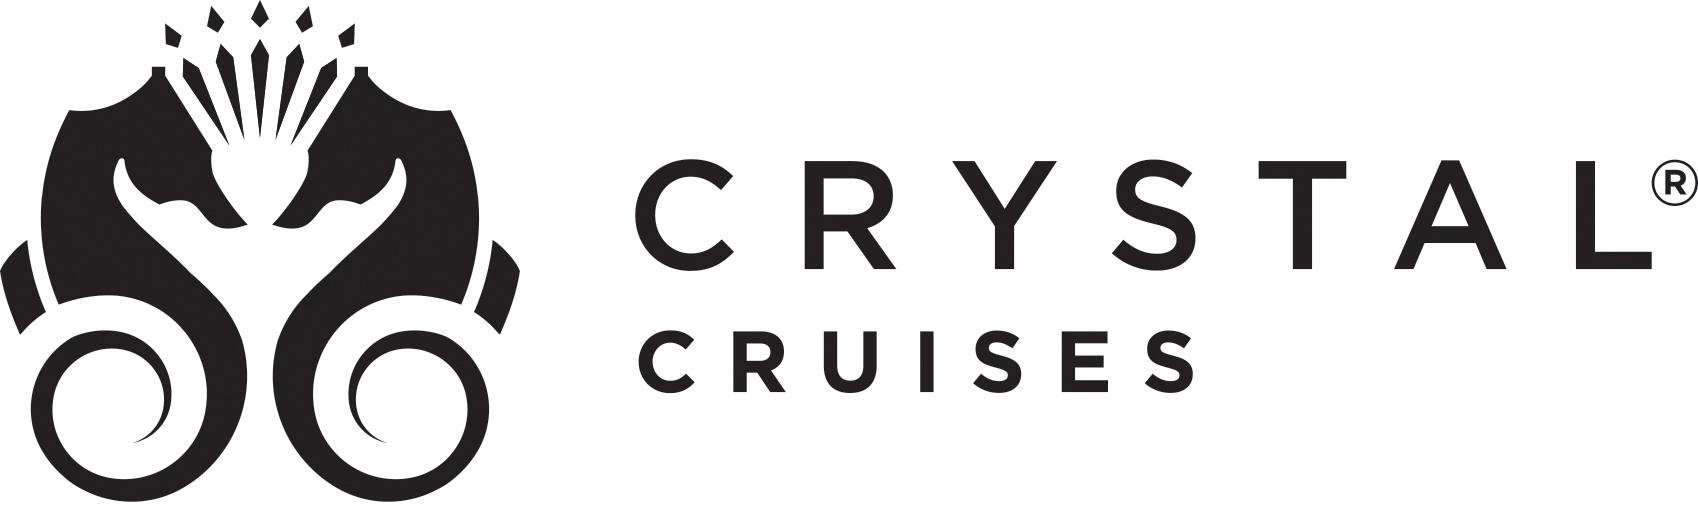 Crystal_Cruises_2016_ Logo_(Horizontal).jpg